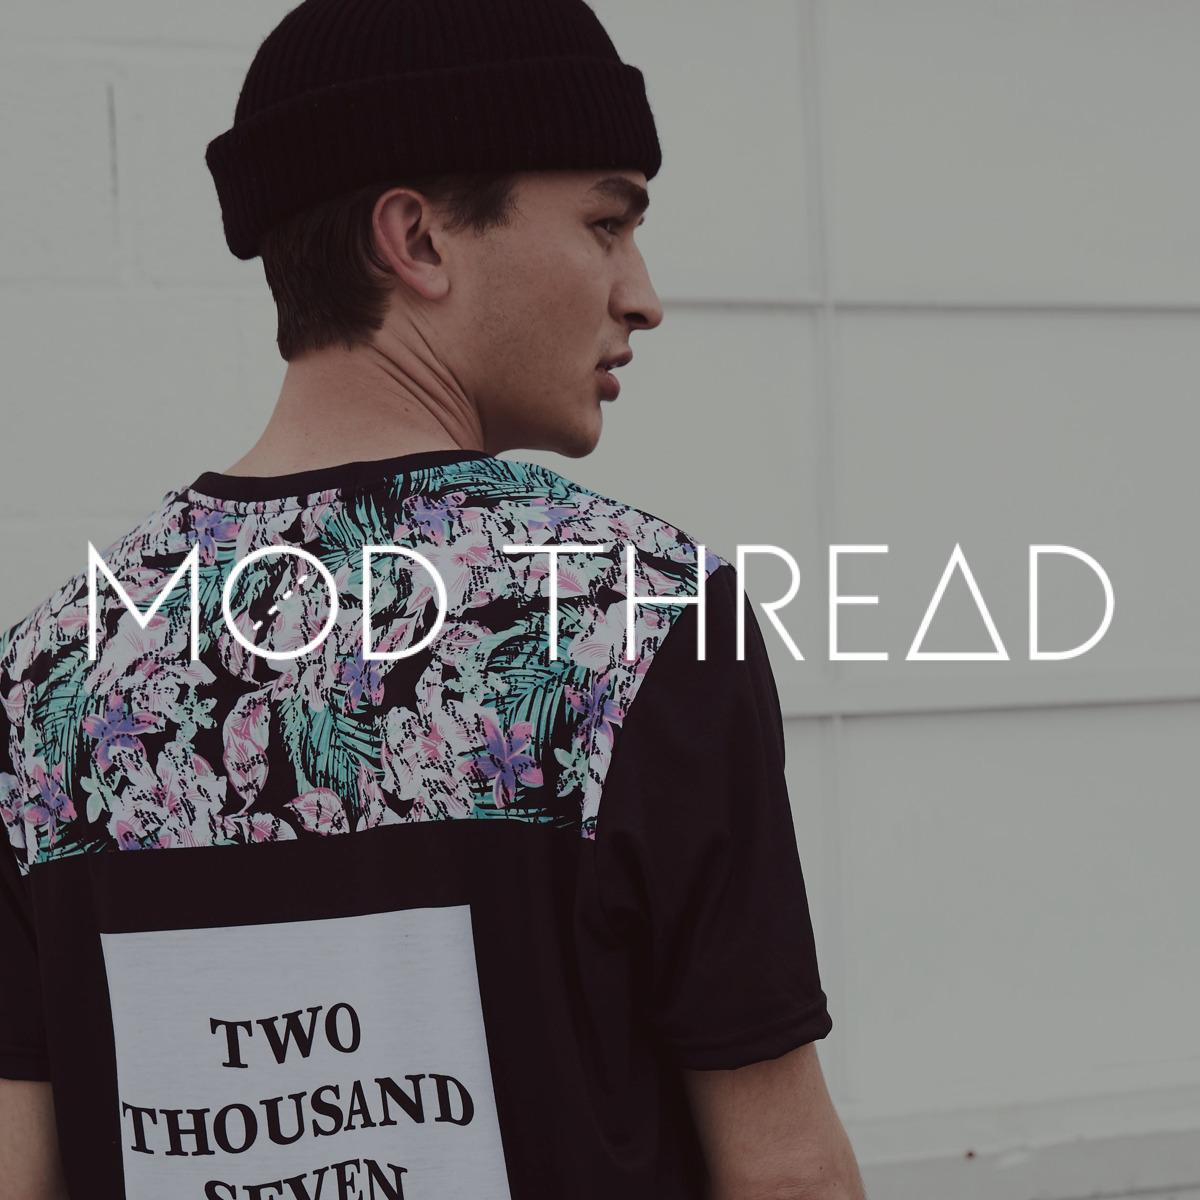 Mod Thread Artist Capsule